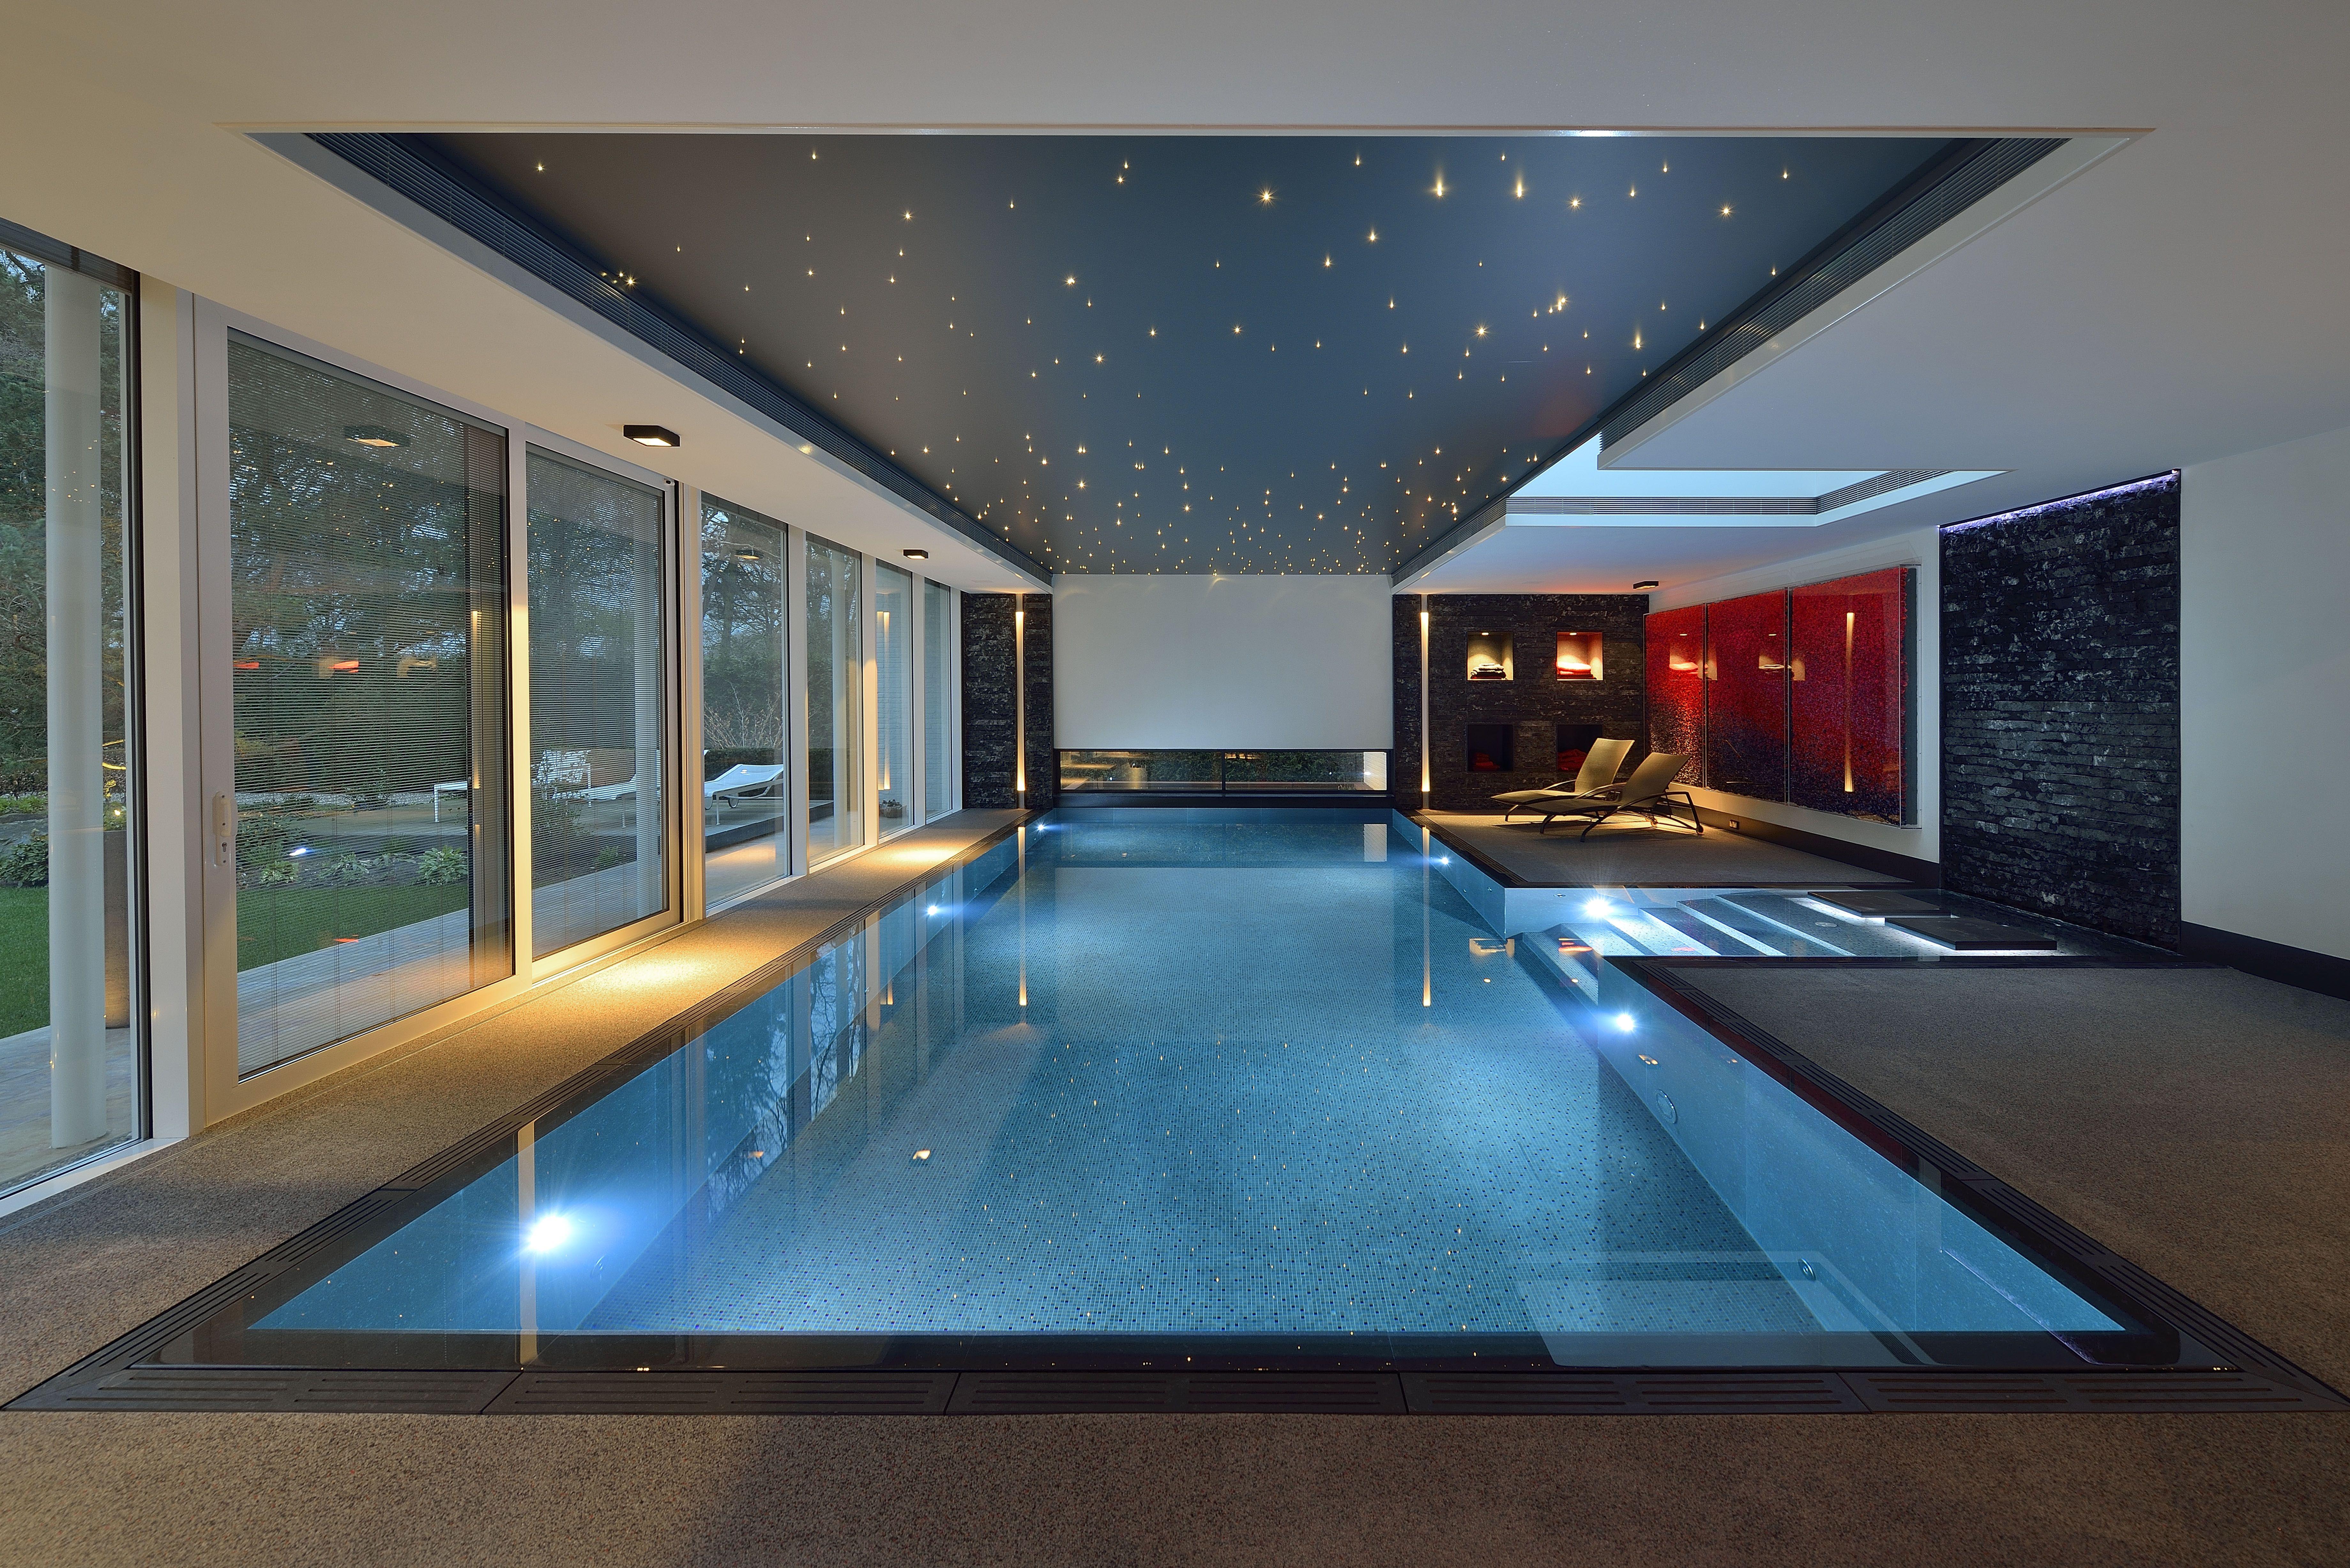 Domotica swimmingpool domotica zwembad binnenzwembad villa home